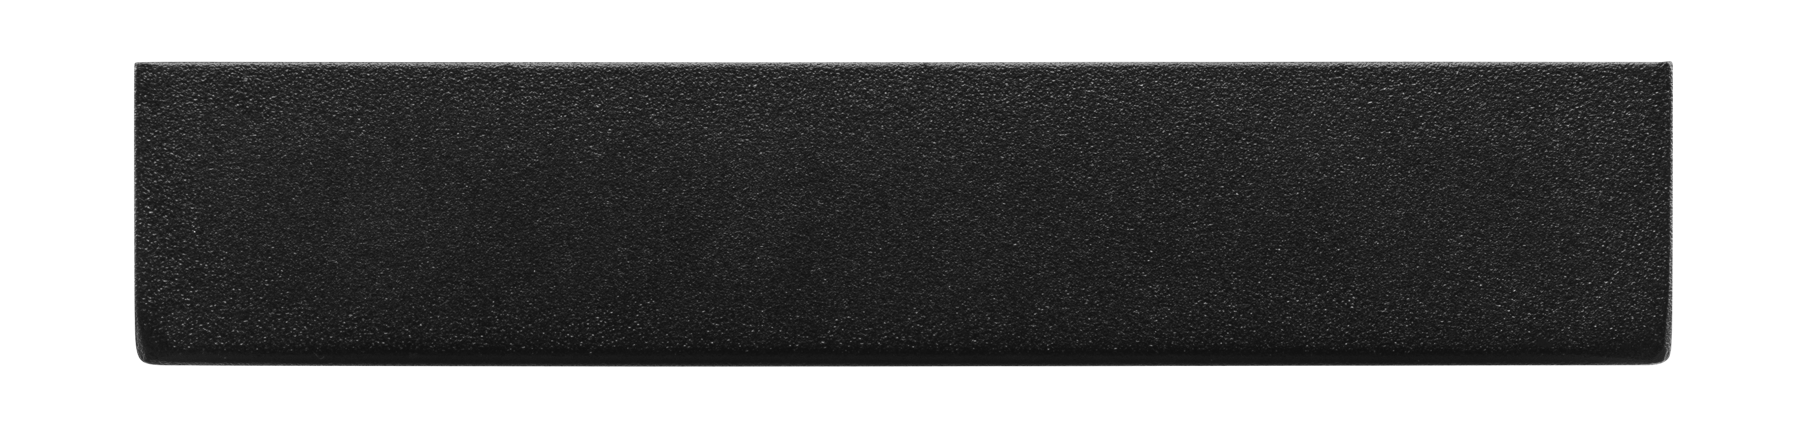 77202800 128 UW 28 side right s1800x